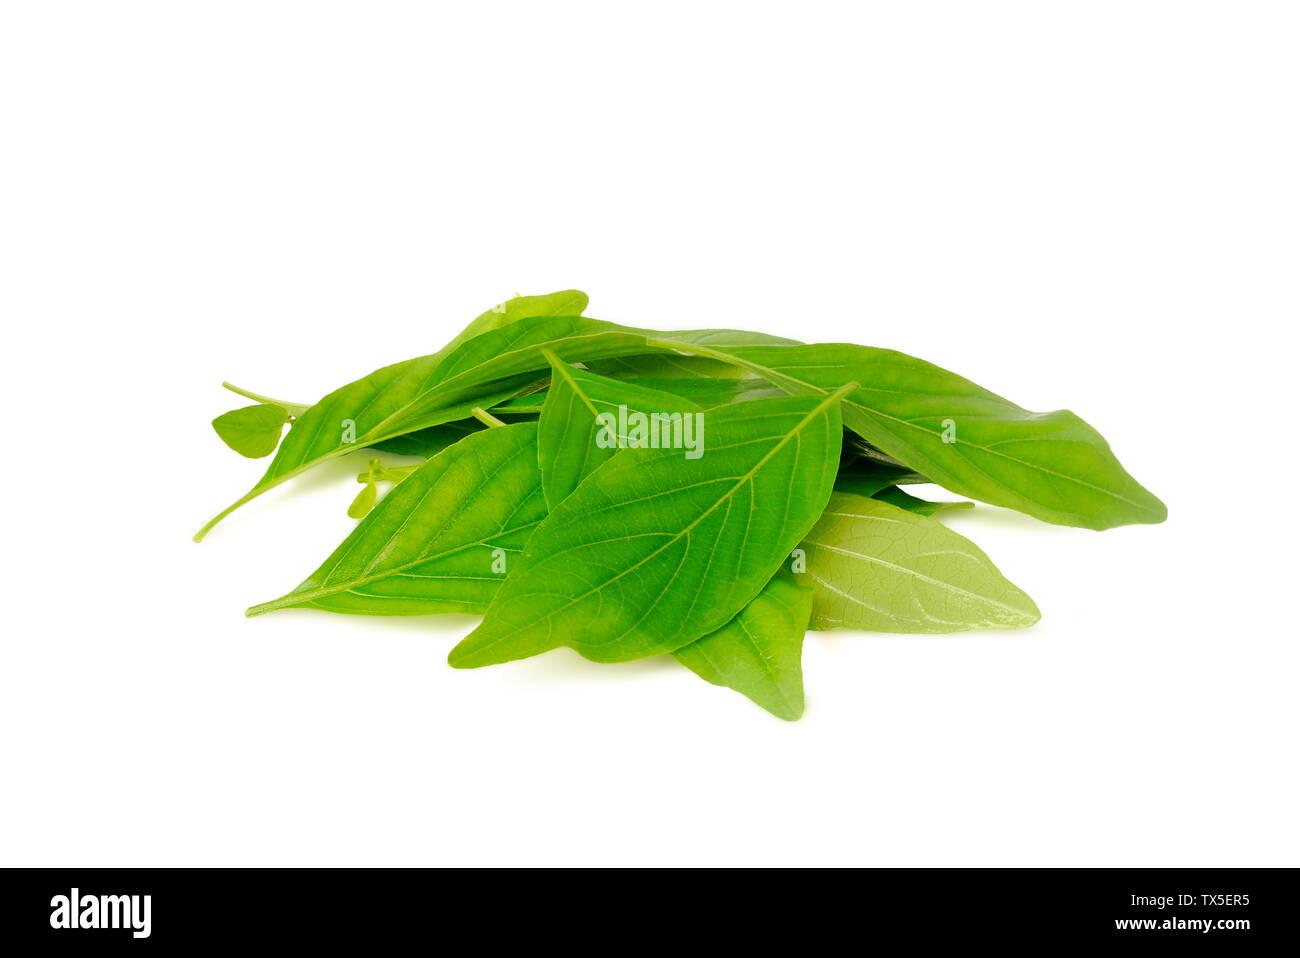 Nasutus Herbal extract. Rhinacanthus nasutus Kurz.Rhinacanthus.With Clipping Path. - Stock Image